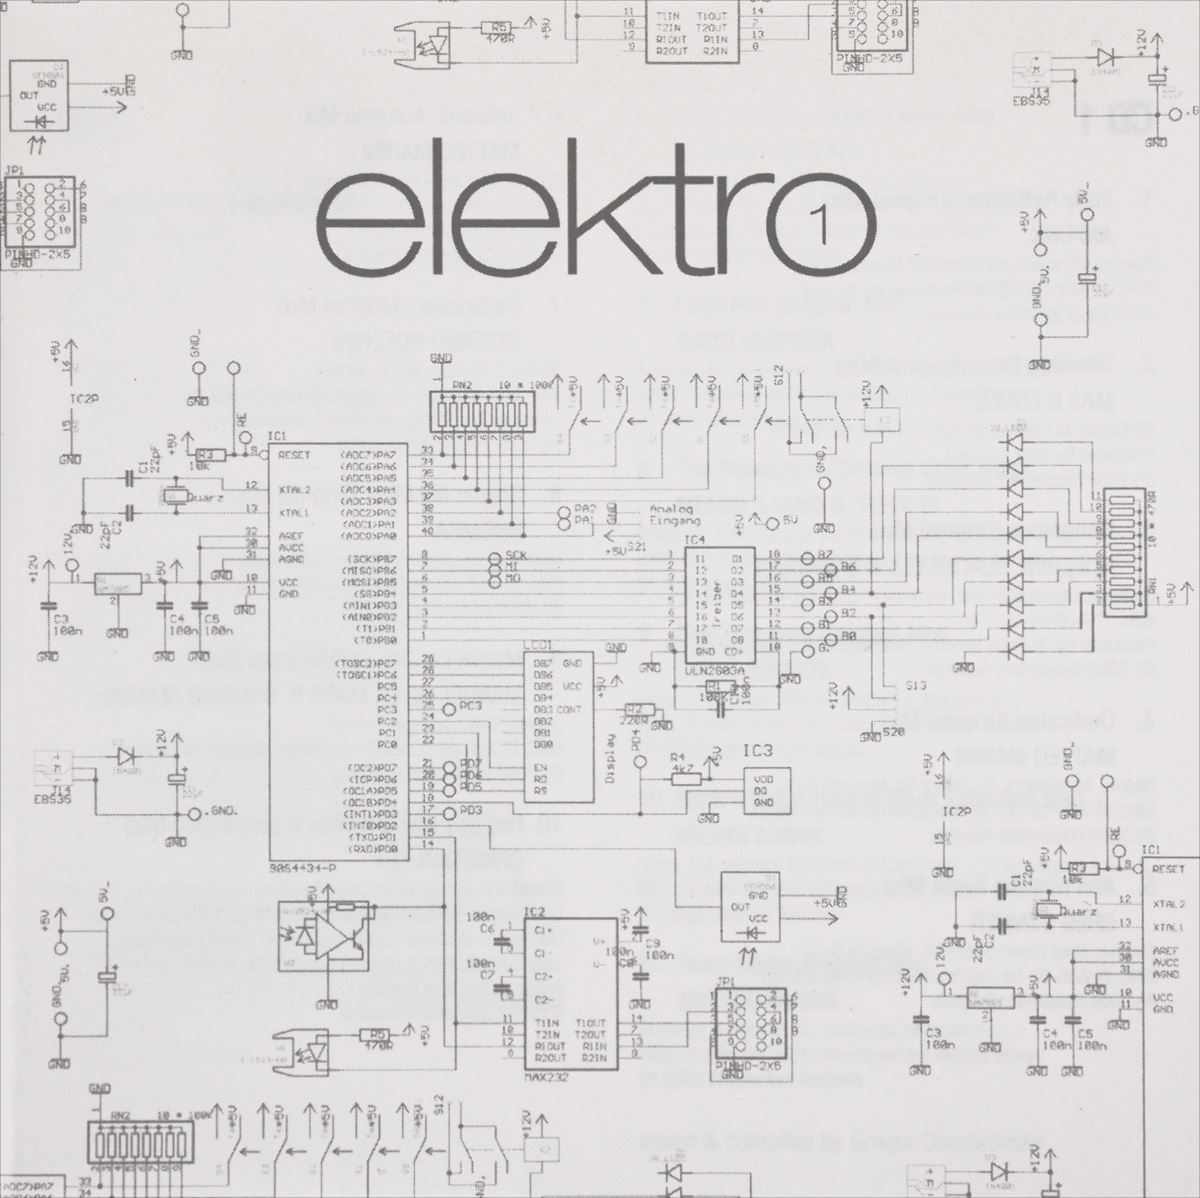 Elektro Vol. 1 (2 CD) hit dance vol 1 2 cd